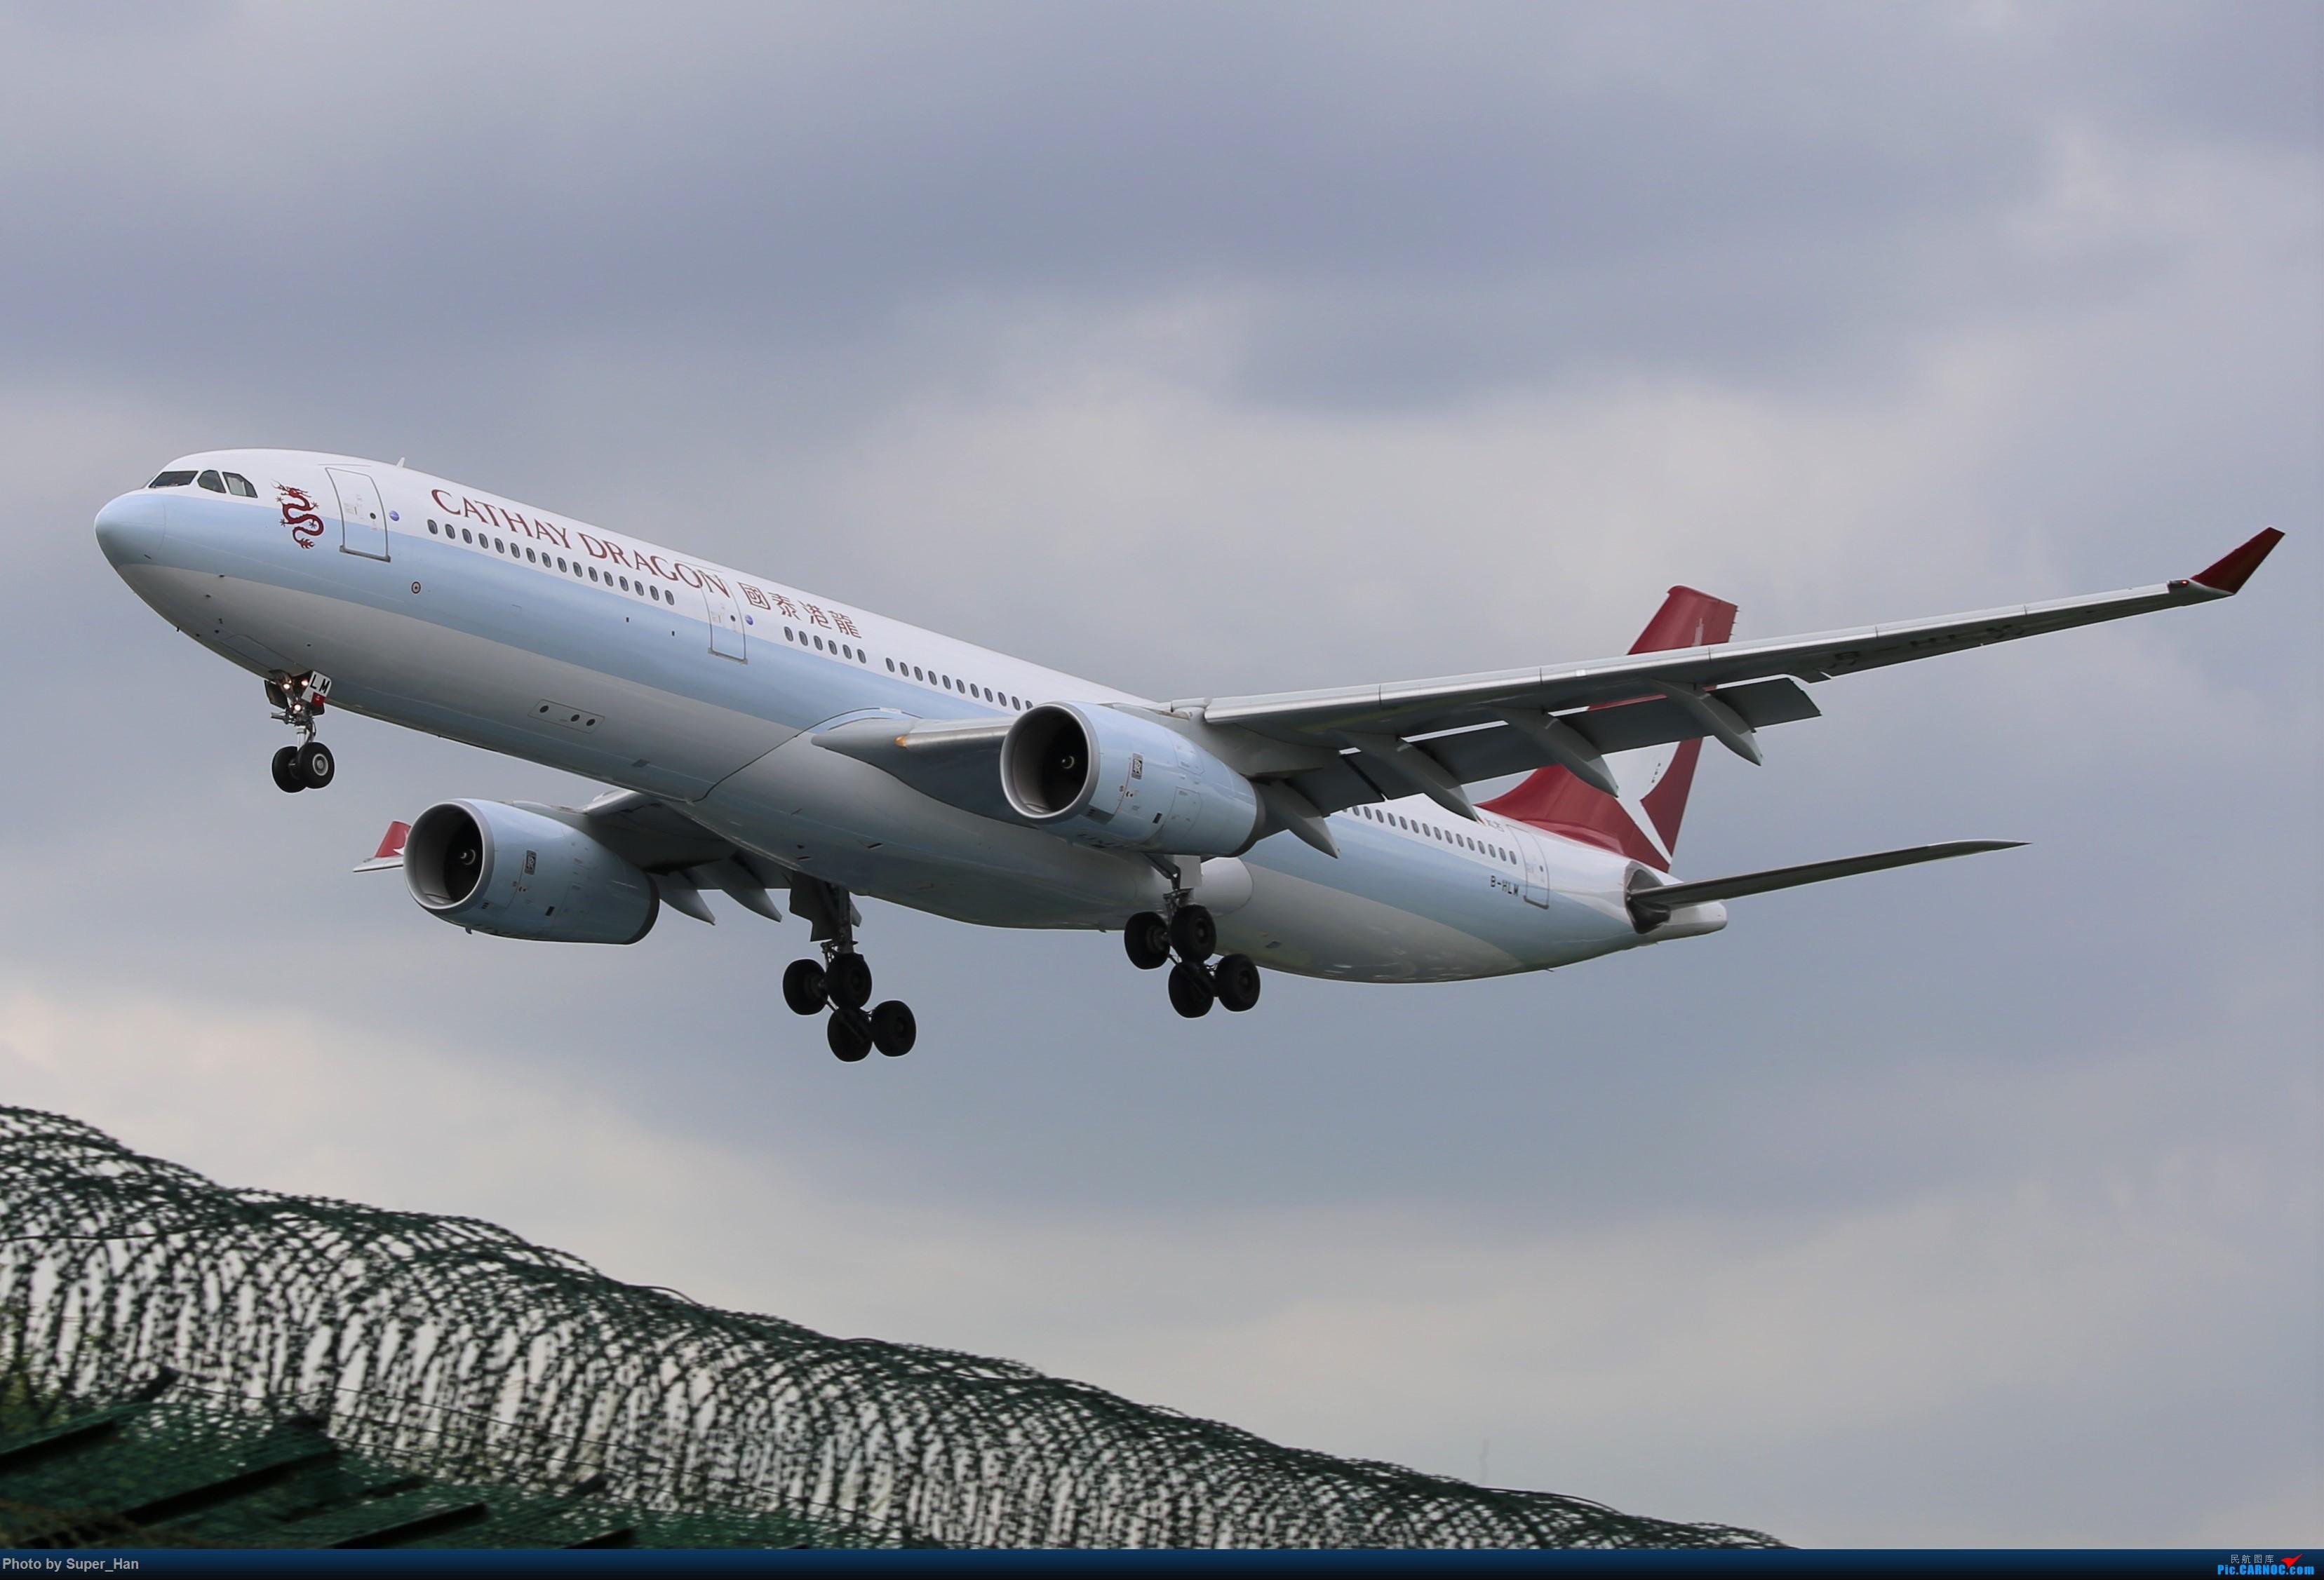 Re:[原创]0831初访XMN AIRBUS A330-300 B-HLM 中国厦门高崎国际机场